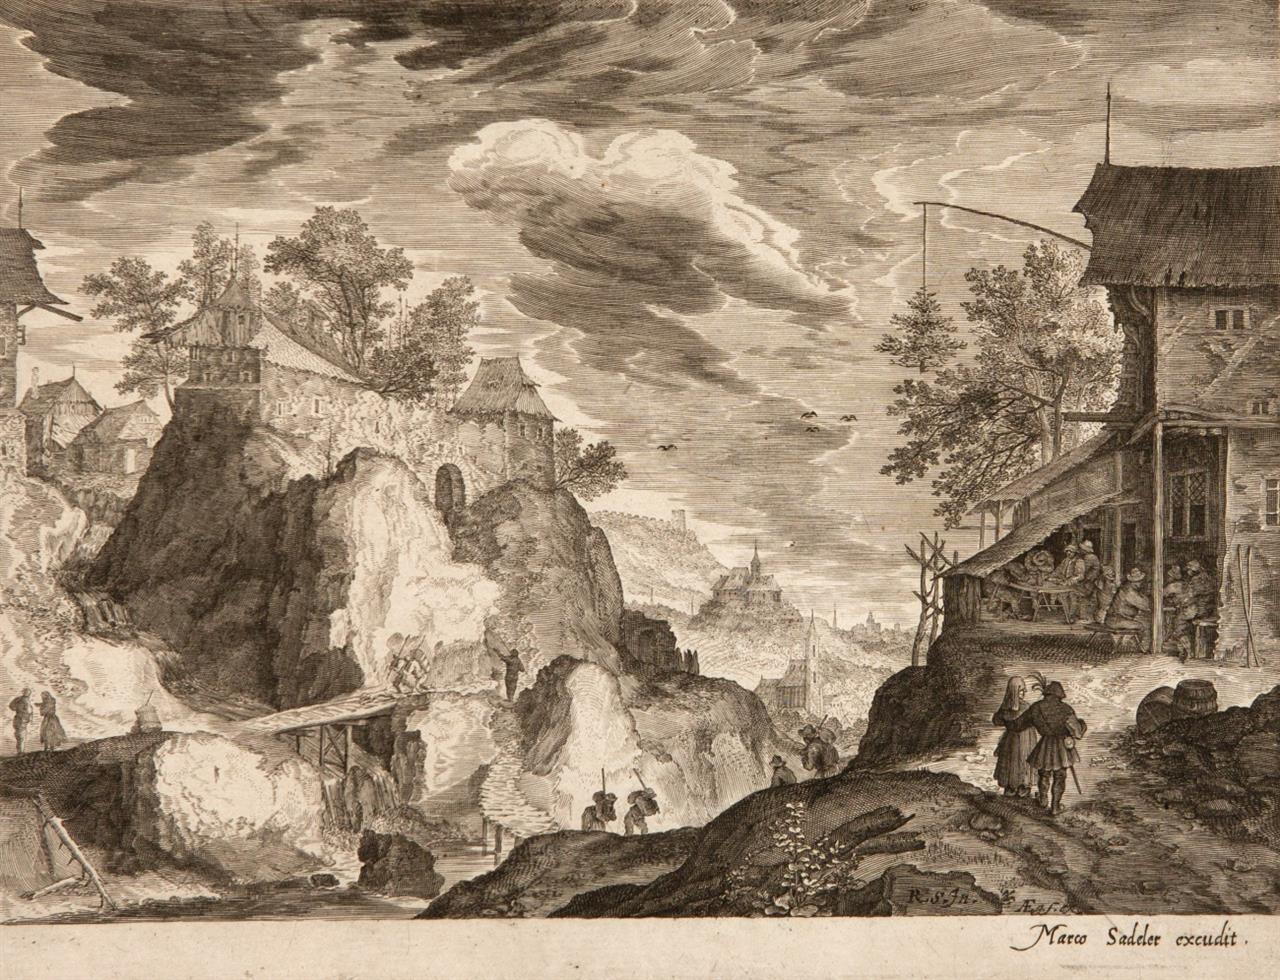 Aegidius Sadeler. Fünf Tiroler Landschaften. 1609. 5 Blatt Kupferstiche. H. 225, 227, 228, 229, 230